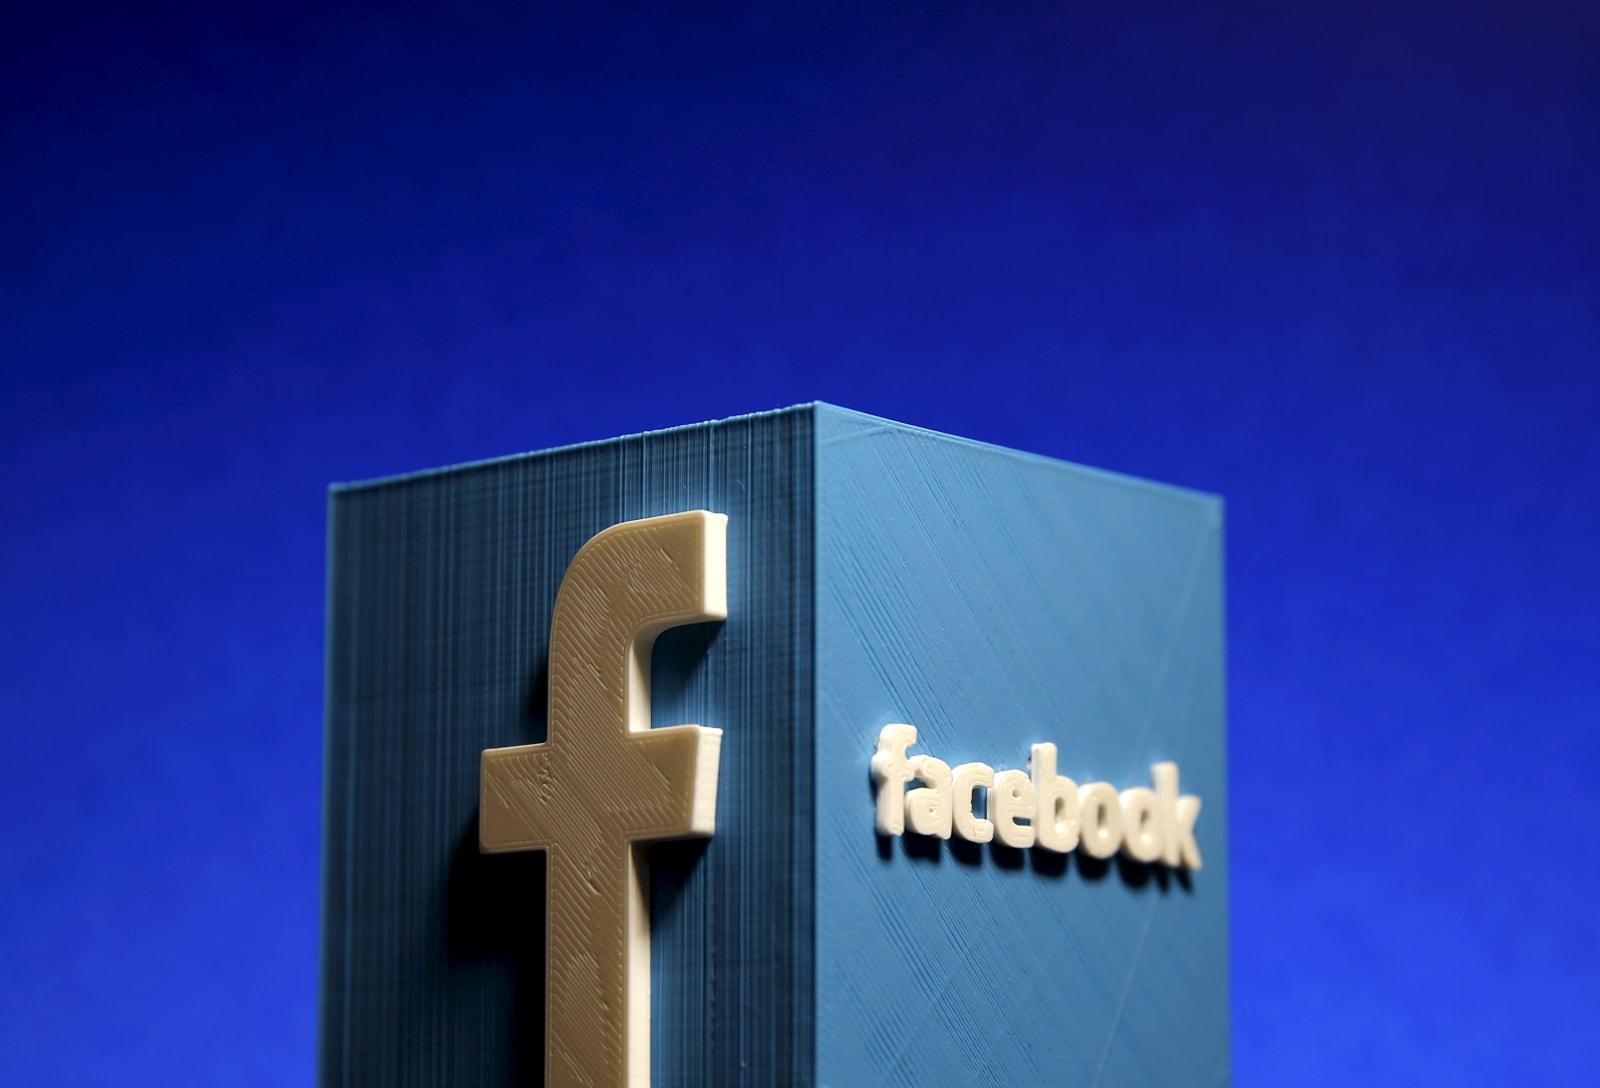 Facebook briefly suspended